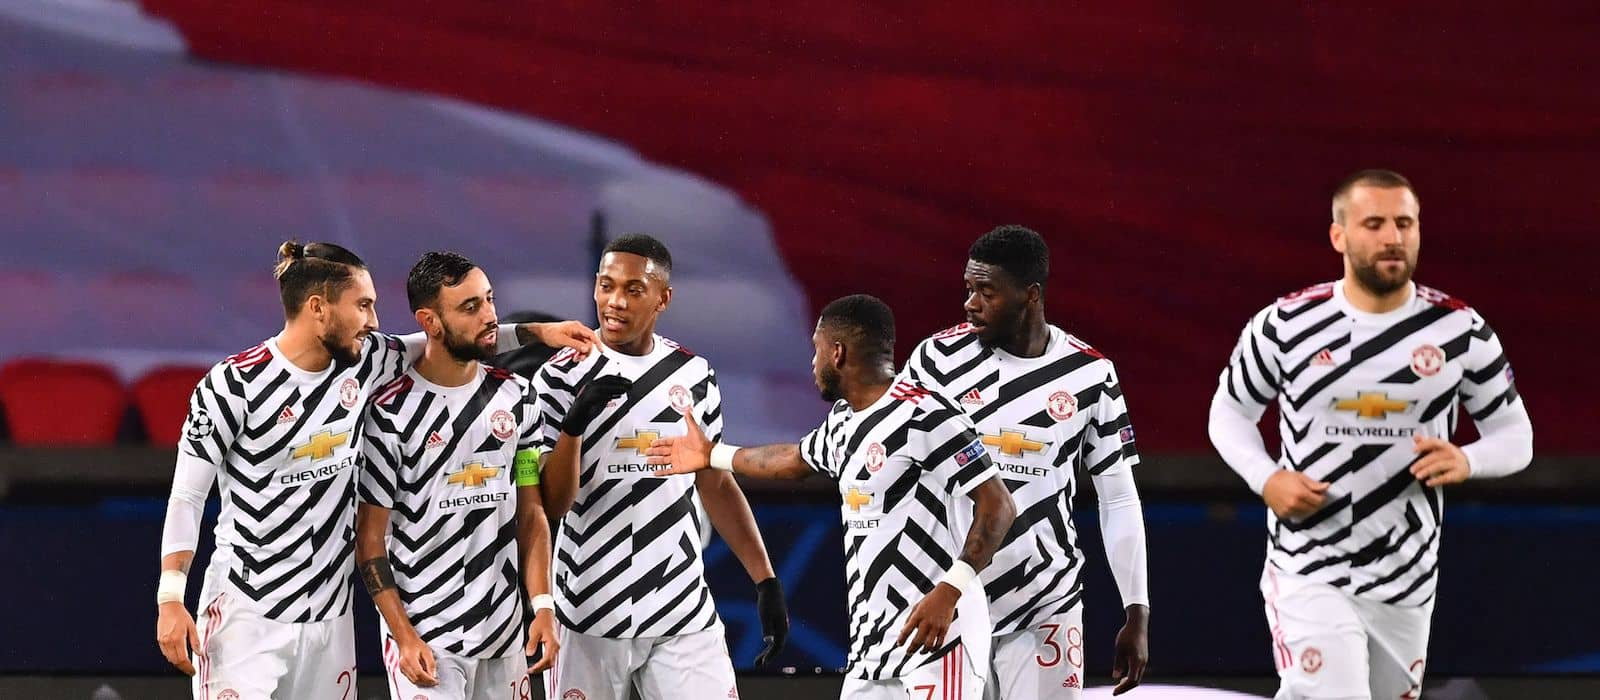 Patrice Evra posts hilarious video celebrating historic Man United win